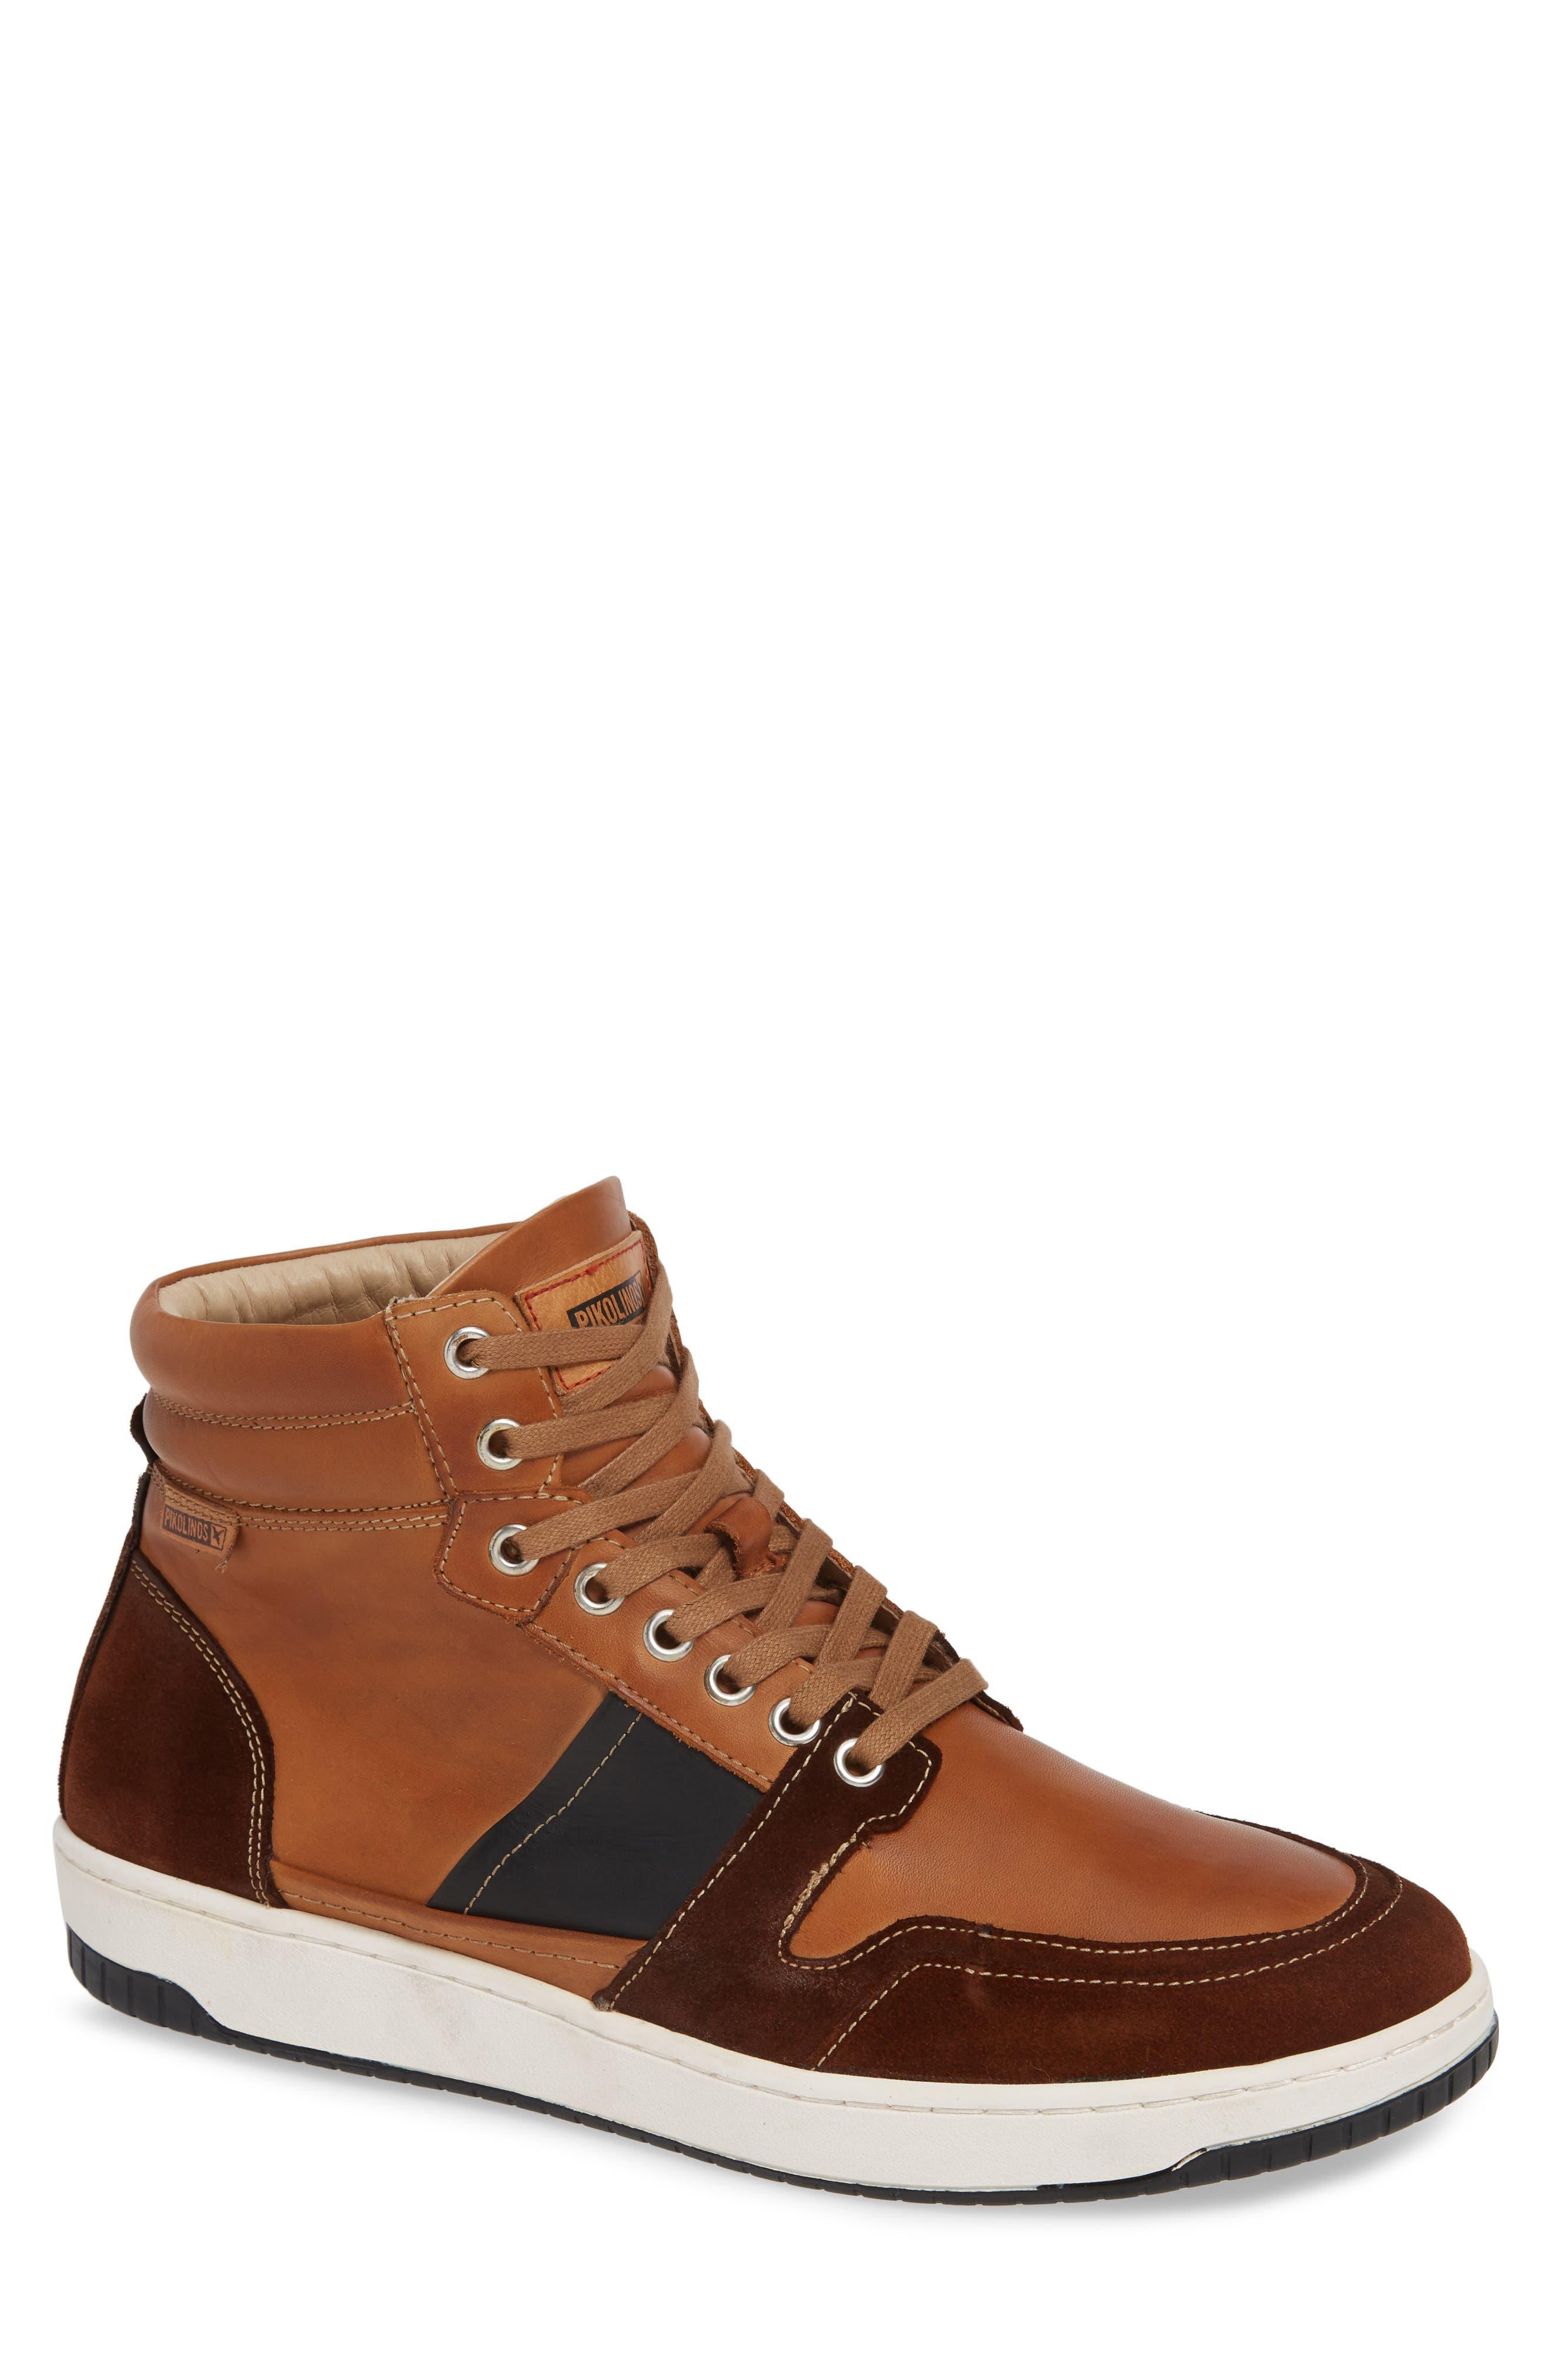 Corinto Sneaker,                             Main thumbnail 1, color,                             BRANDY BLACK